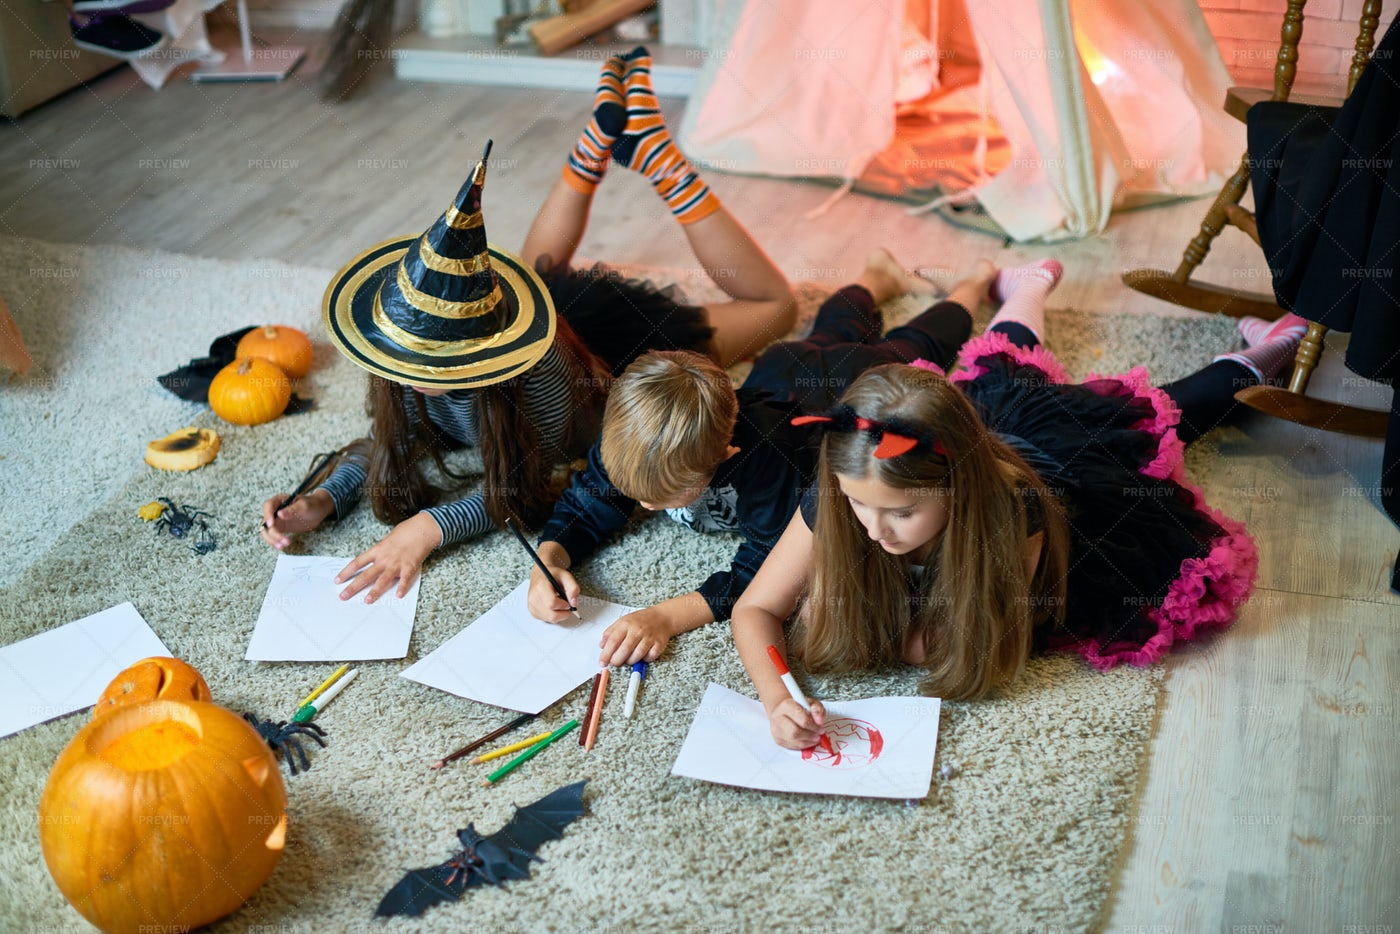 Talented Children Drawing Halloween...: Stock Photos